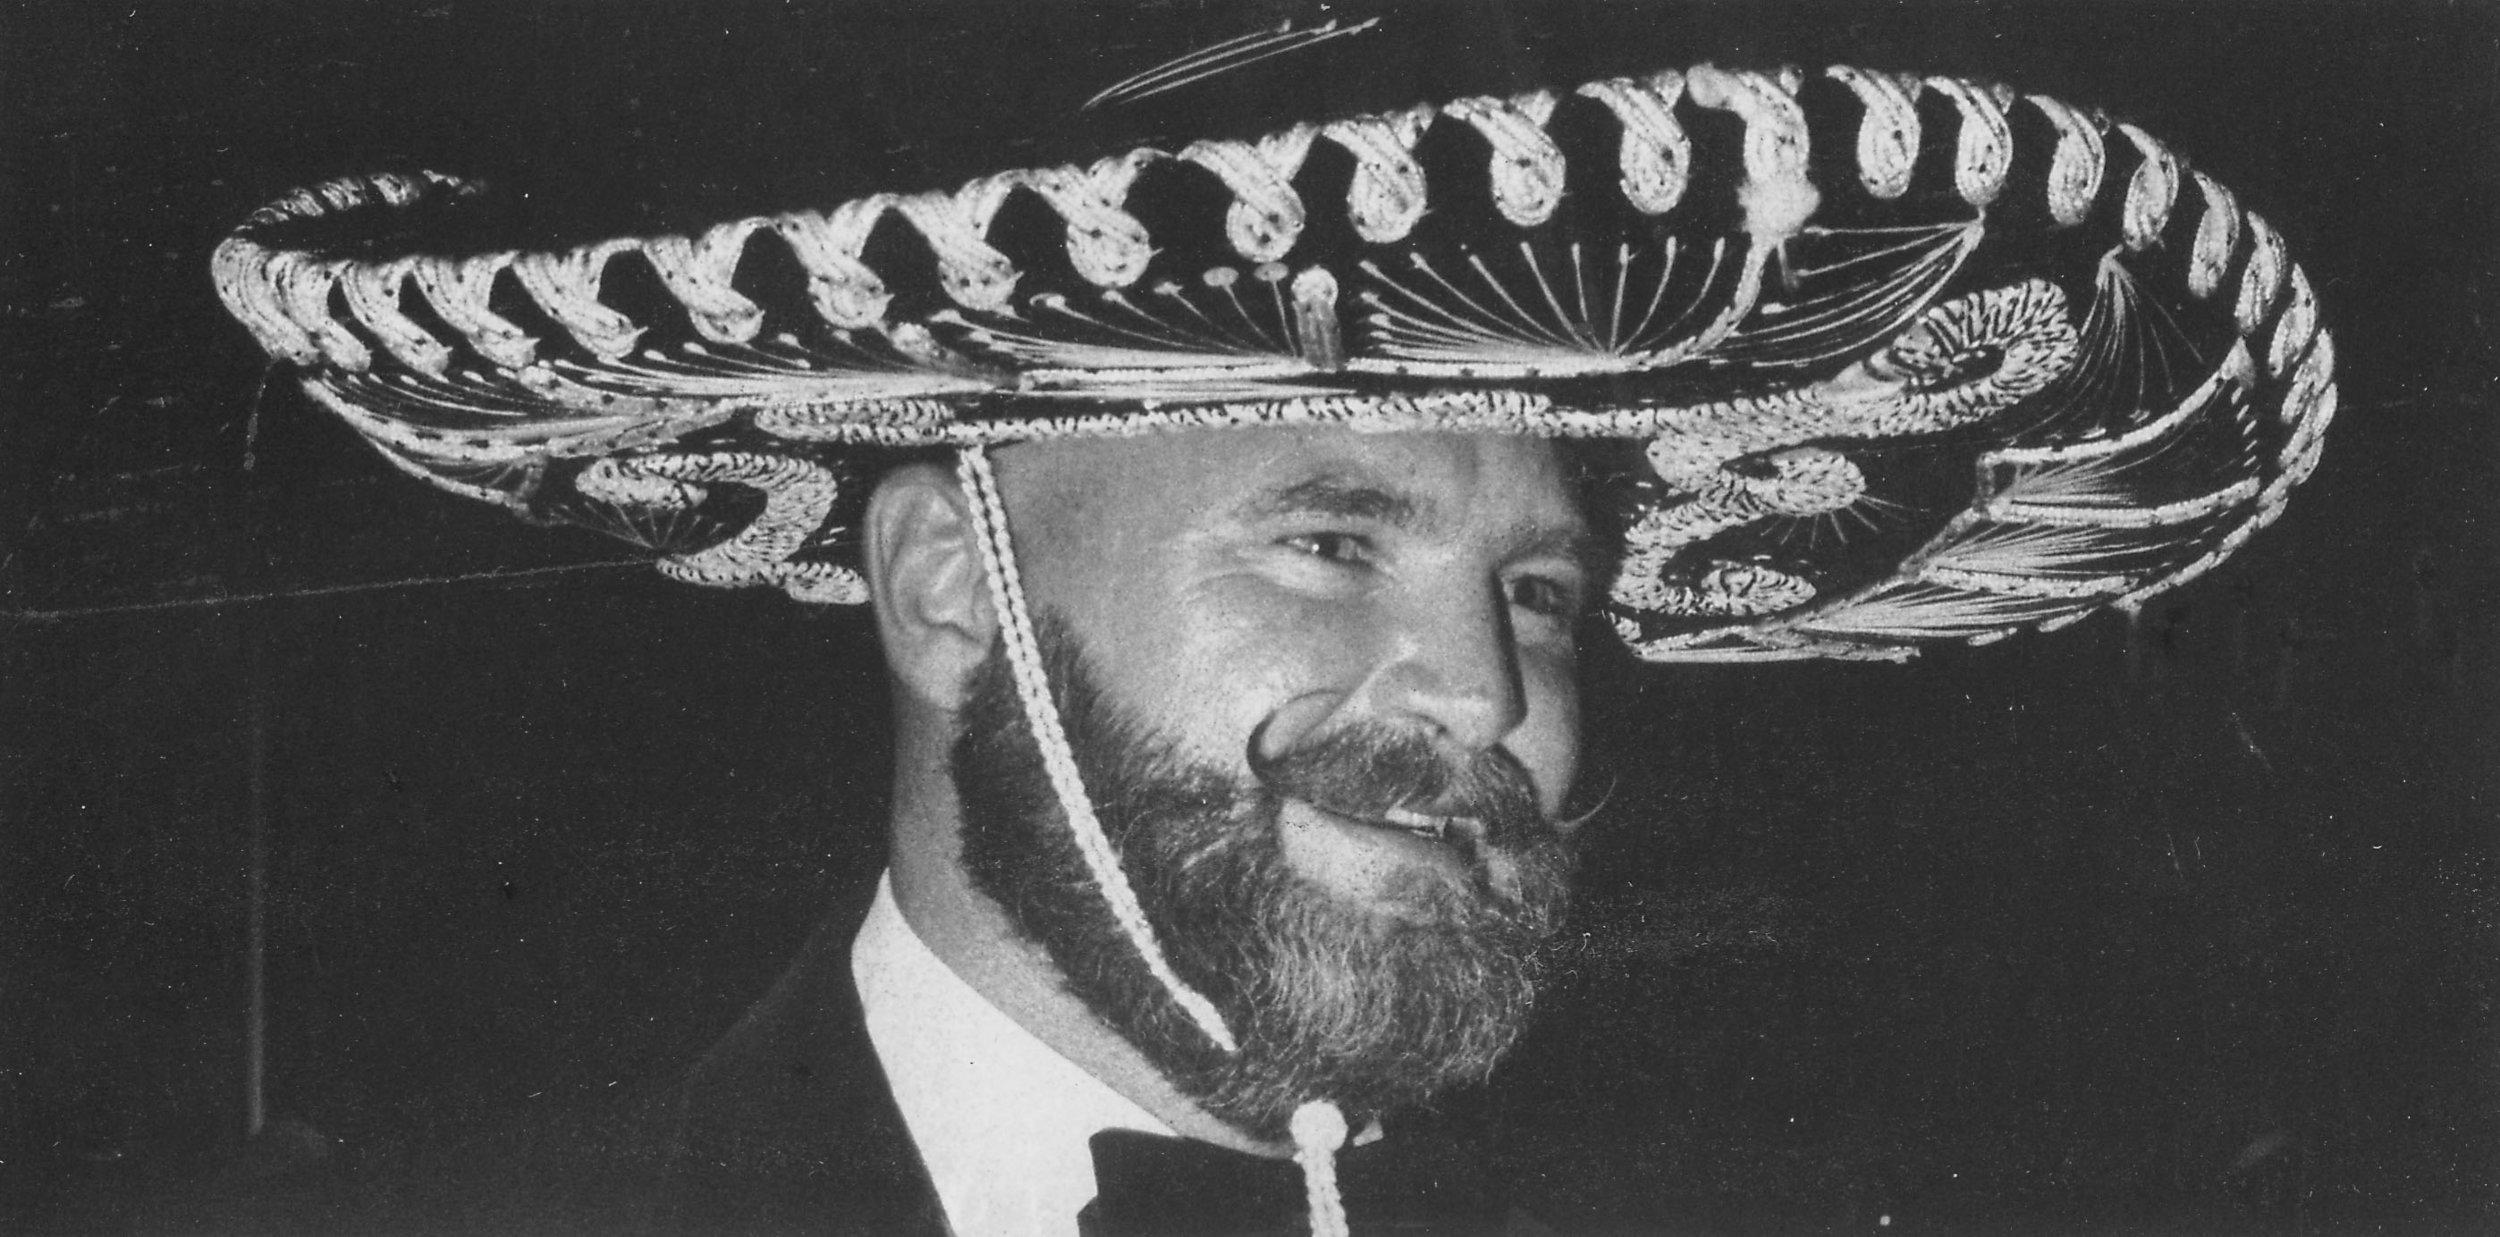 Don Triunfo Dick Elliott at the Triunfo Ball, 1977